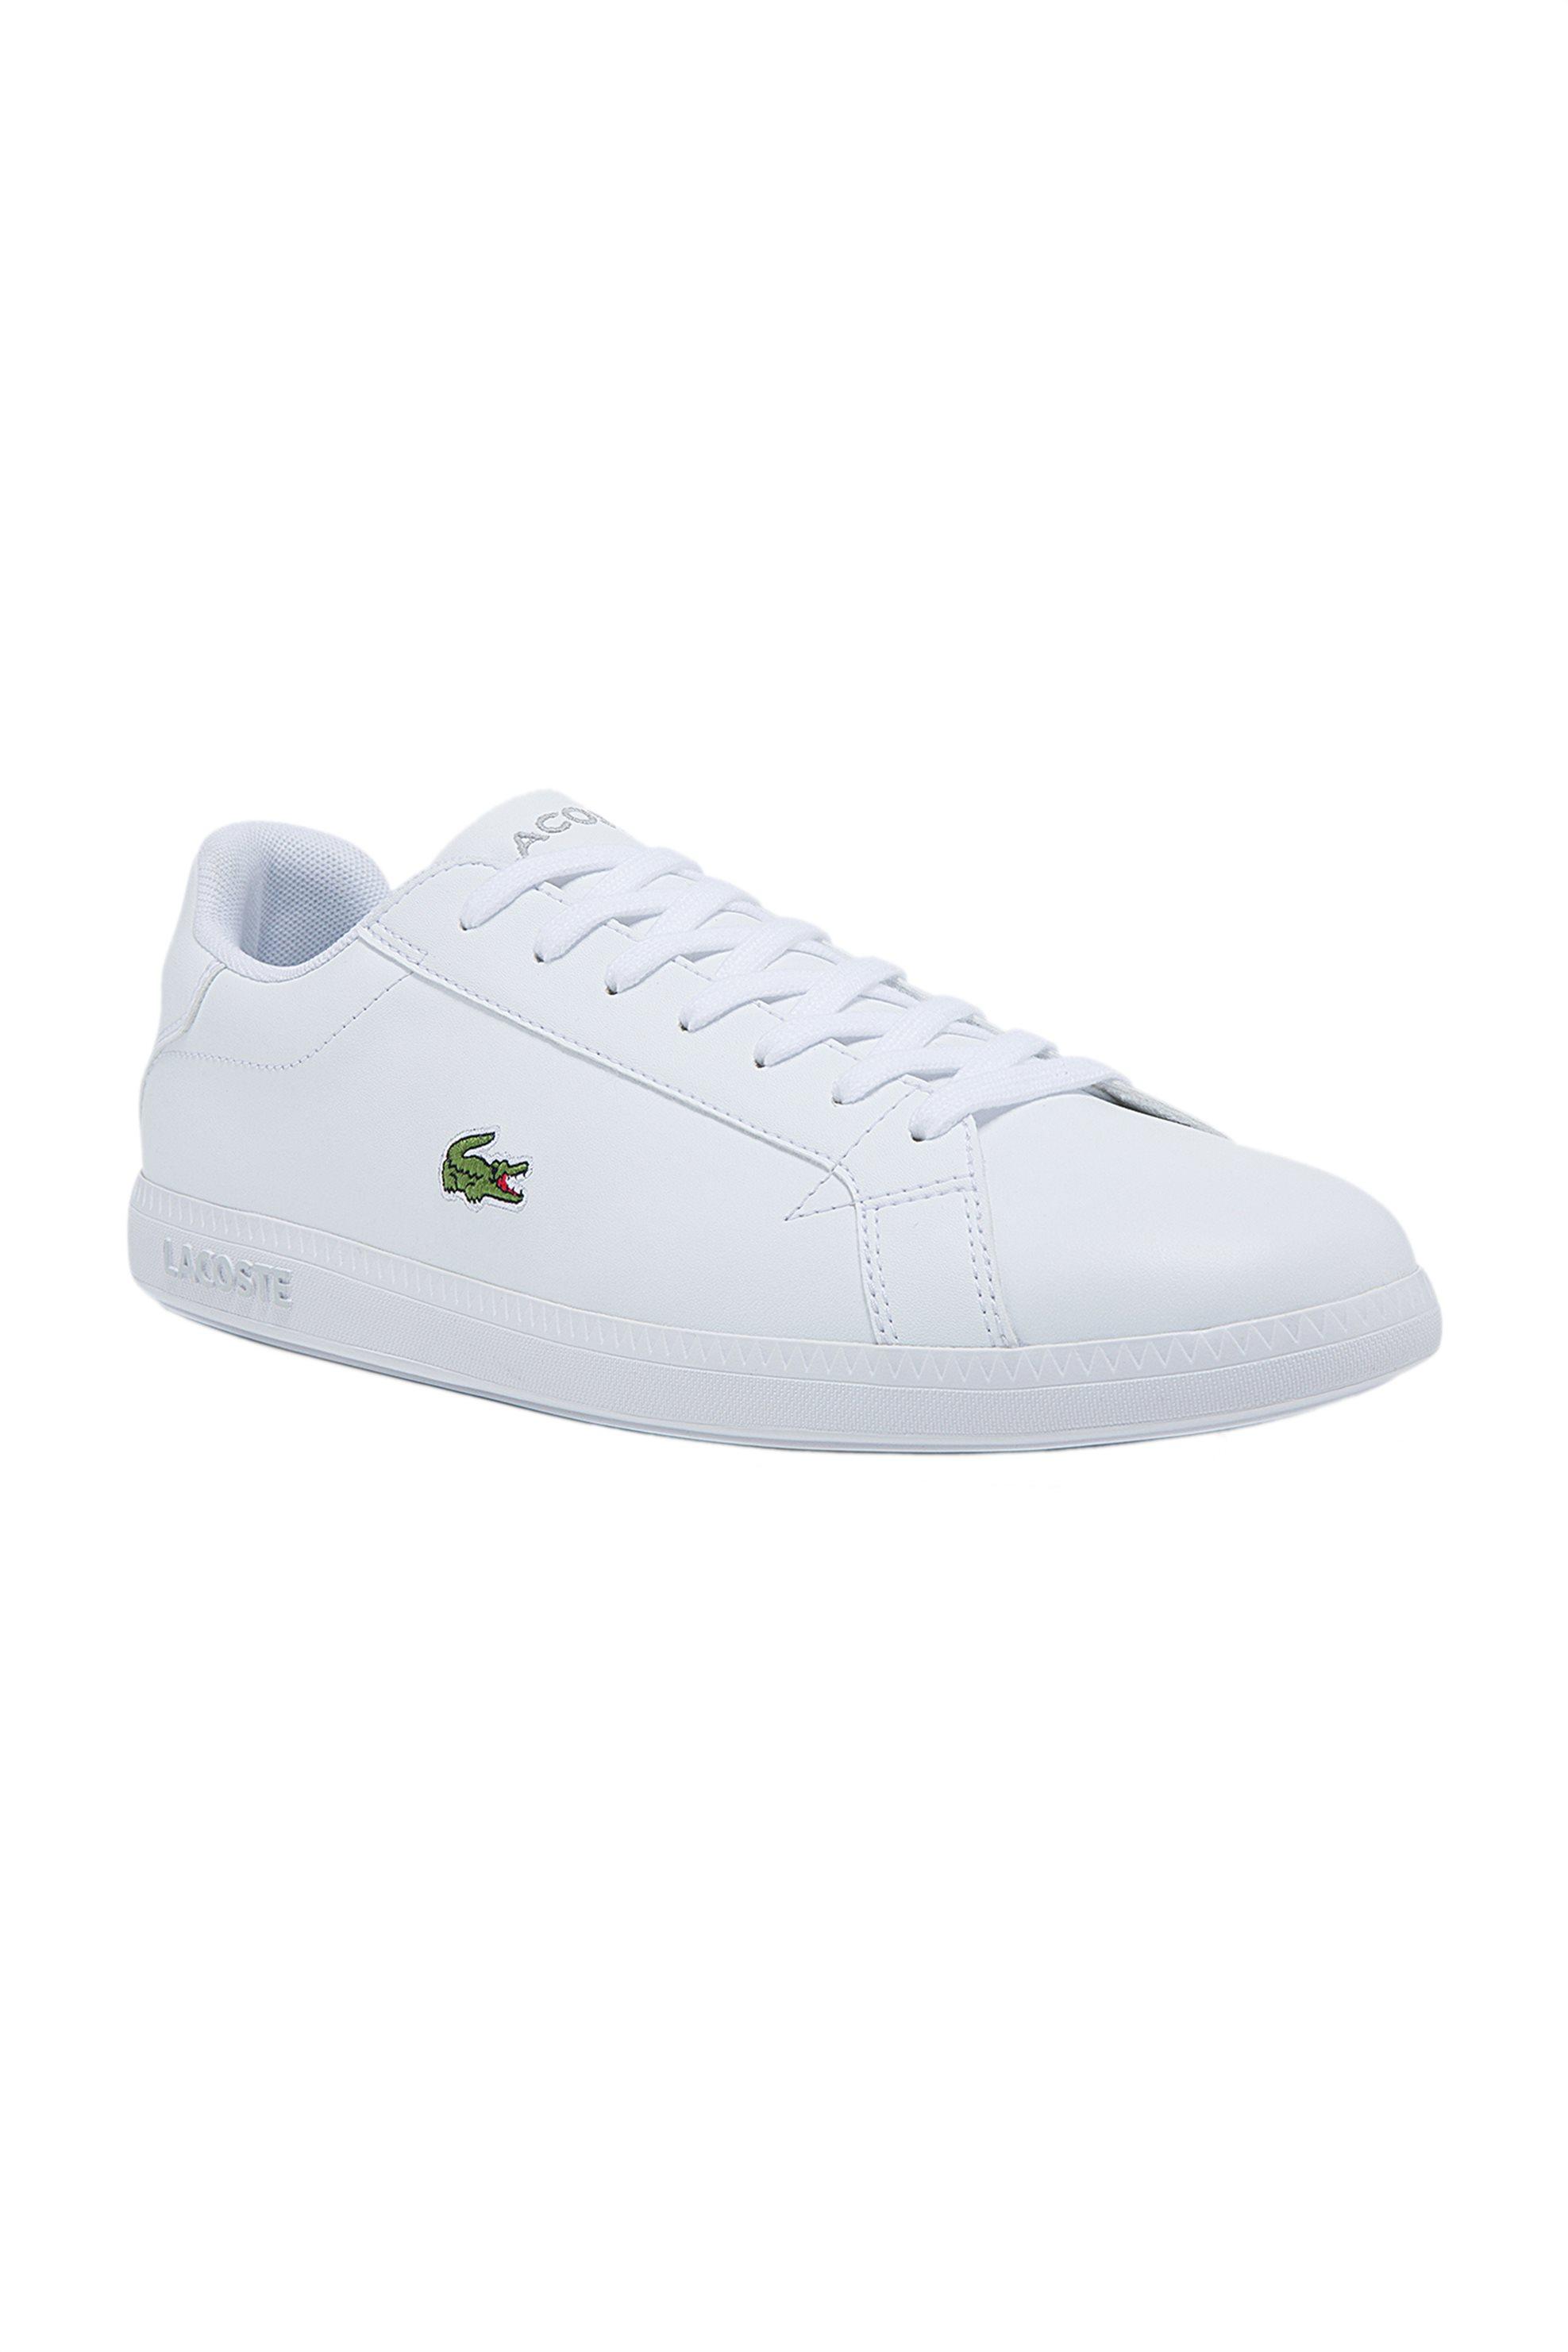 "Lacoste ανδρικά sneakers με κορδόνια ""Graduate"" – 41SMA001221G – Λευκό"